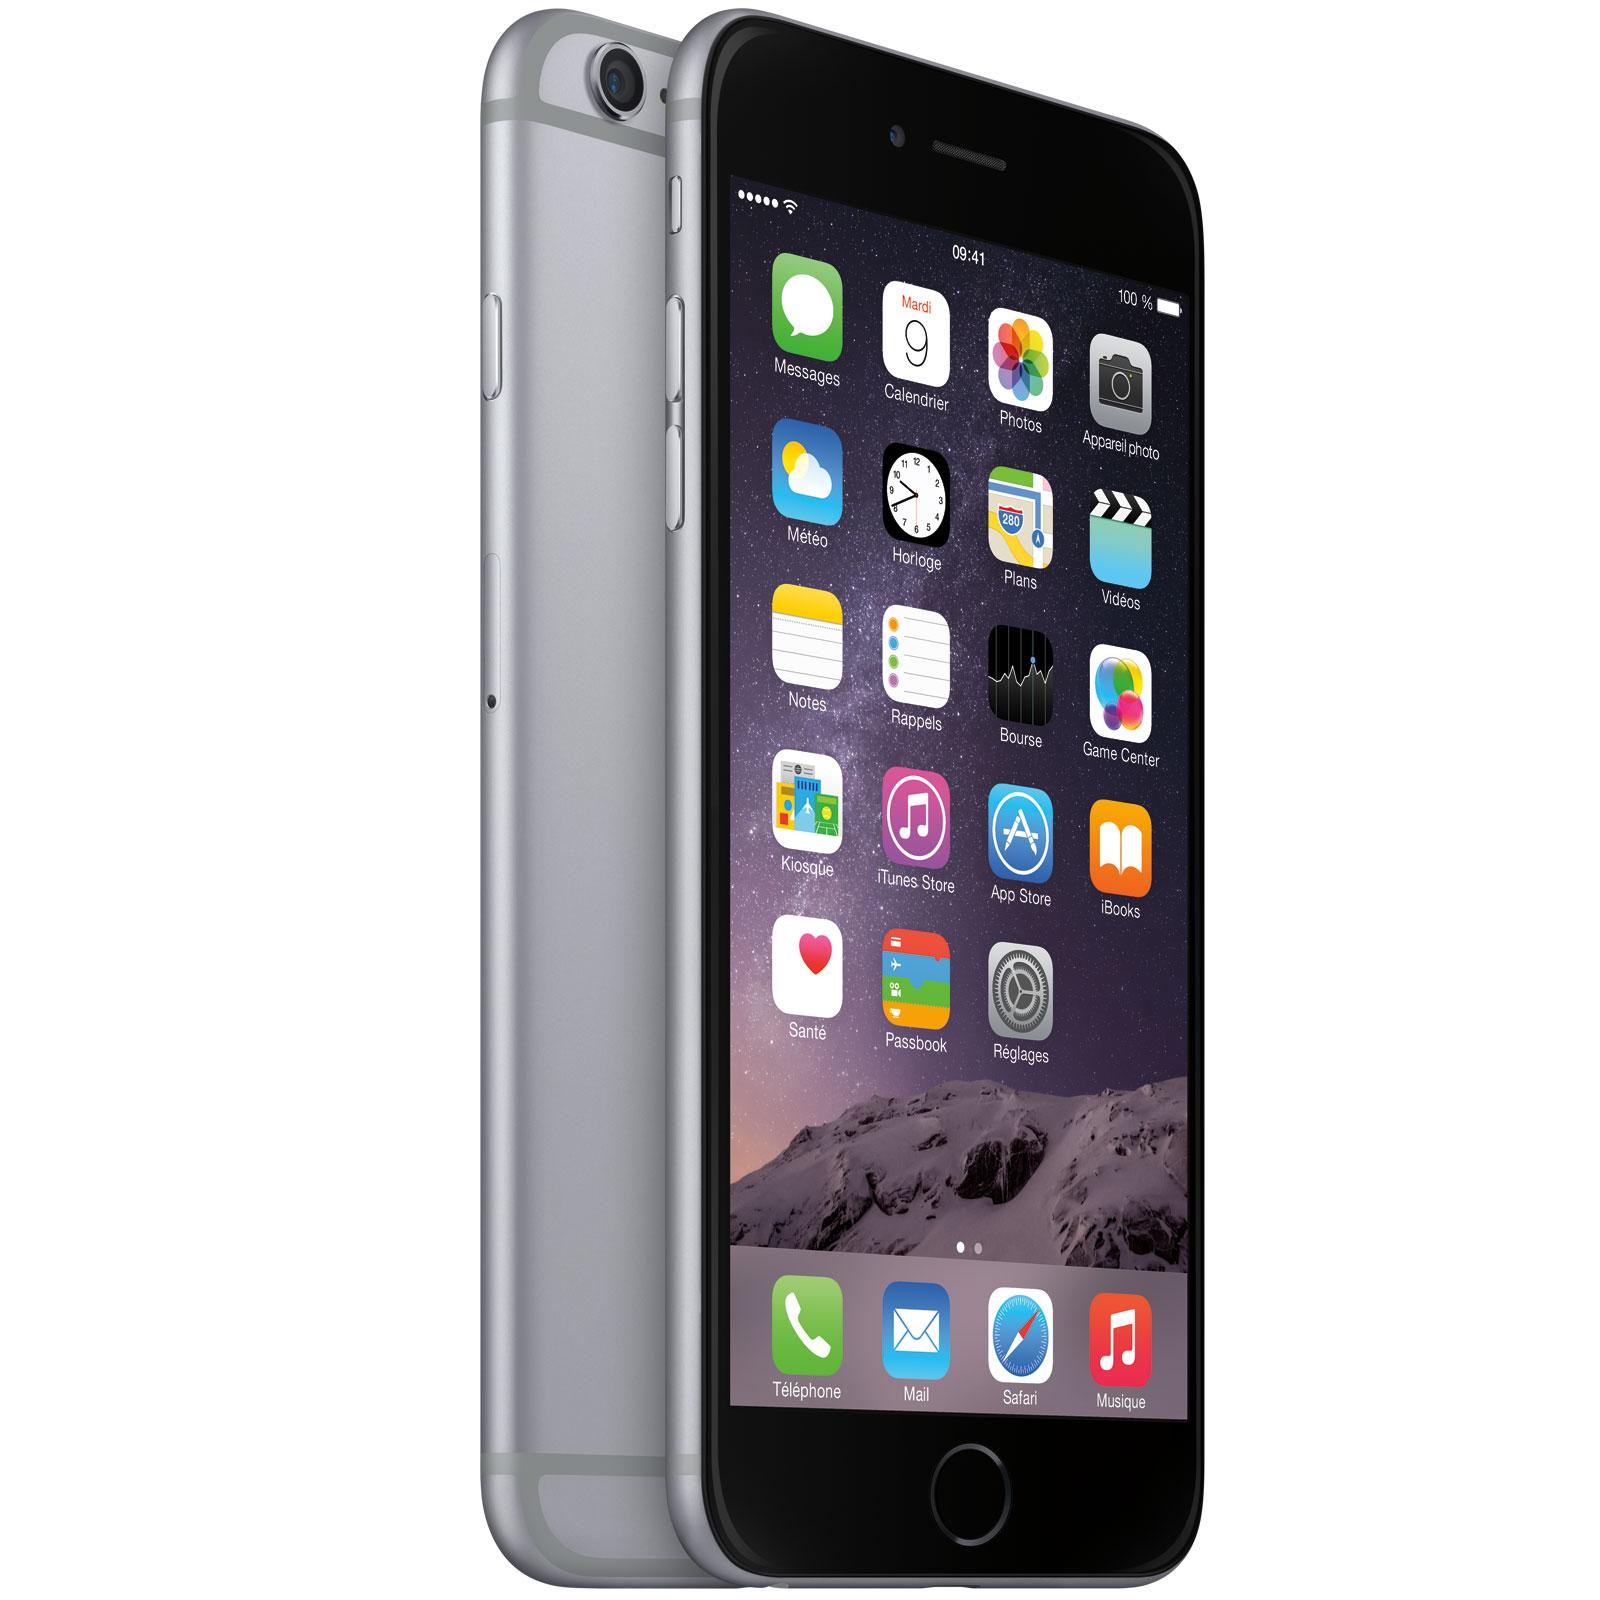 apple iphone 6 plus 16 go gris sid ral mobile smartphone apple sur. Black Bedroom Furniture Sets. Home Design Ideas